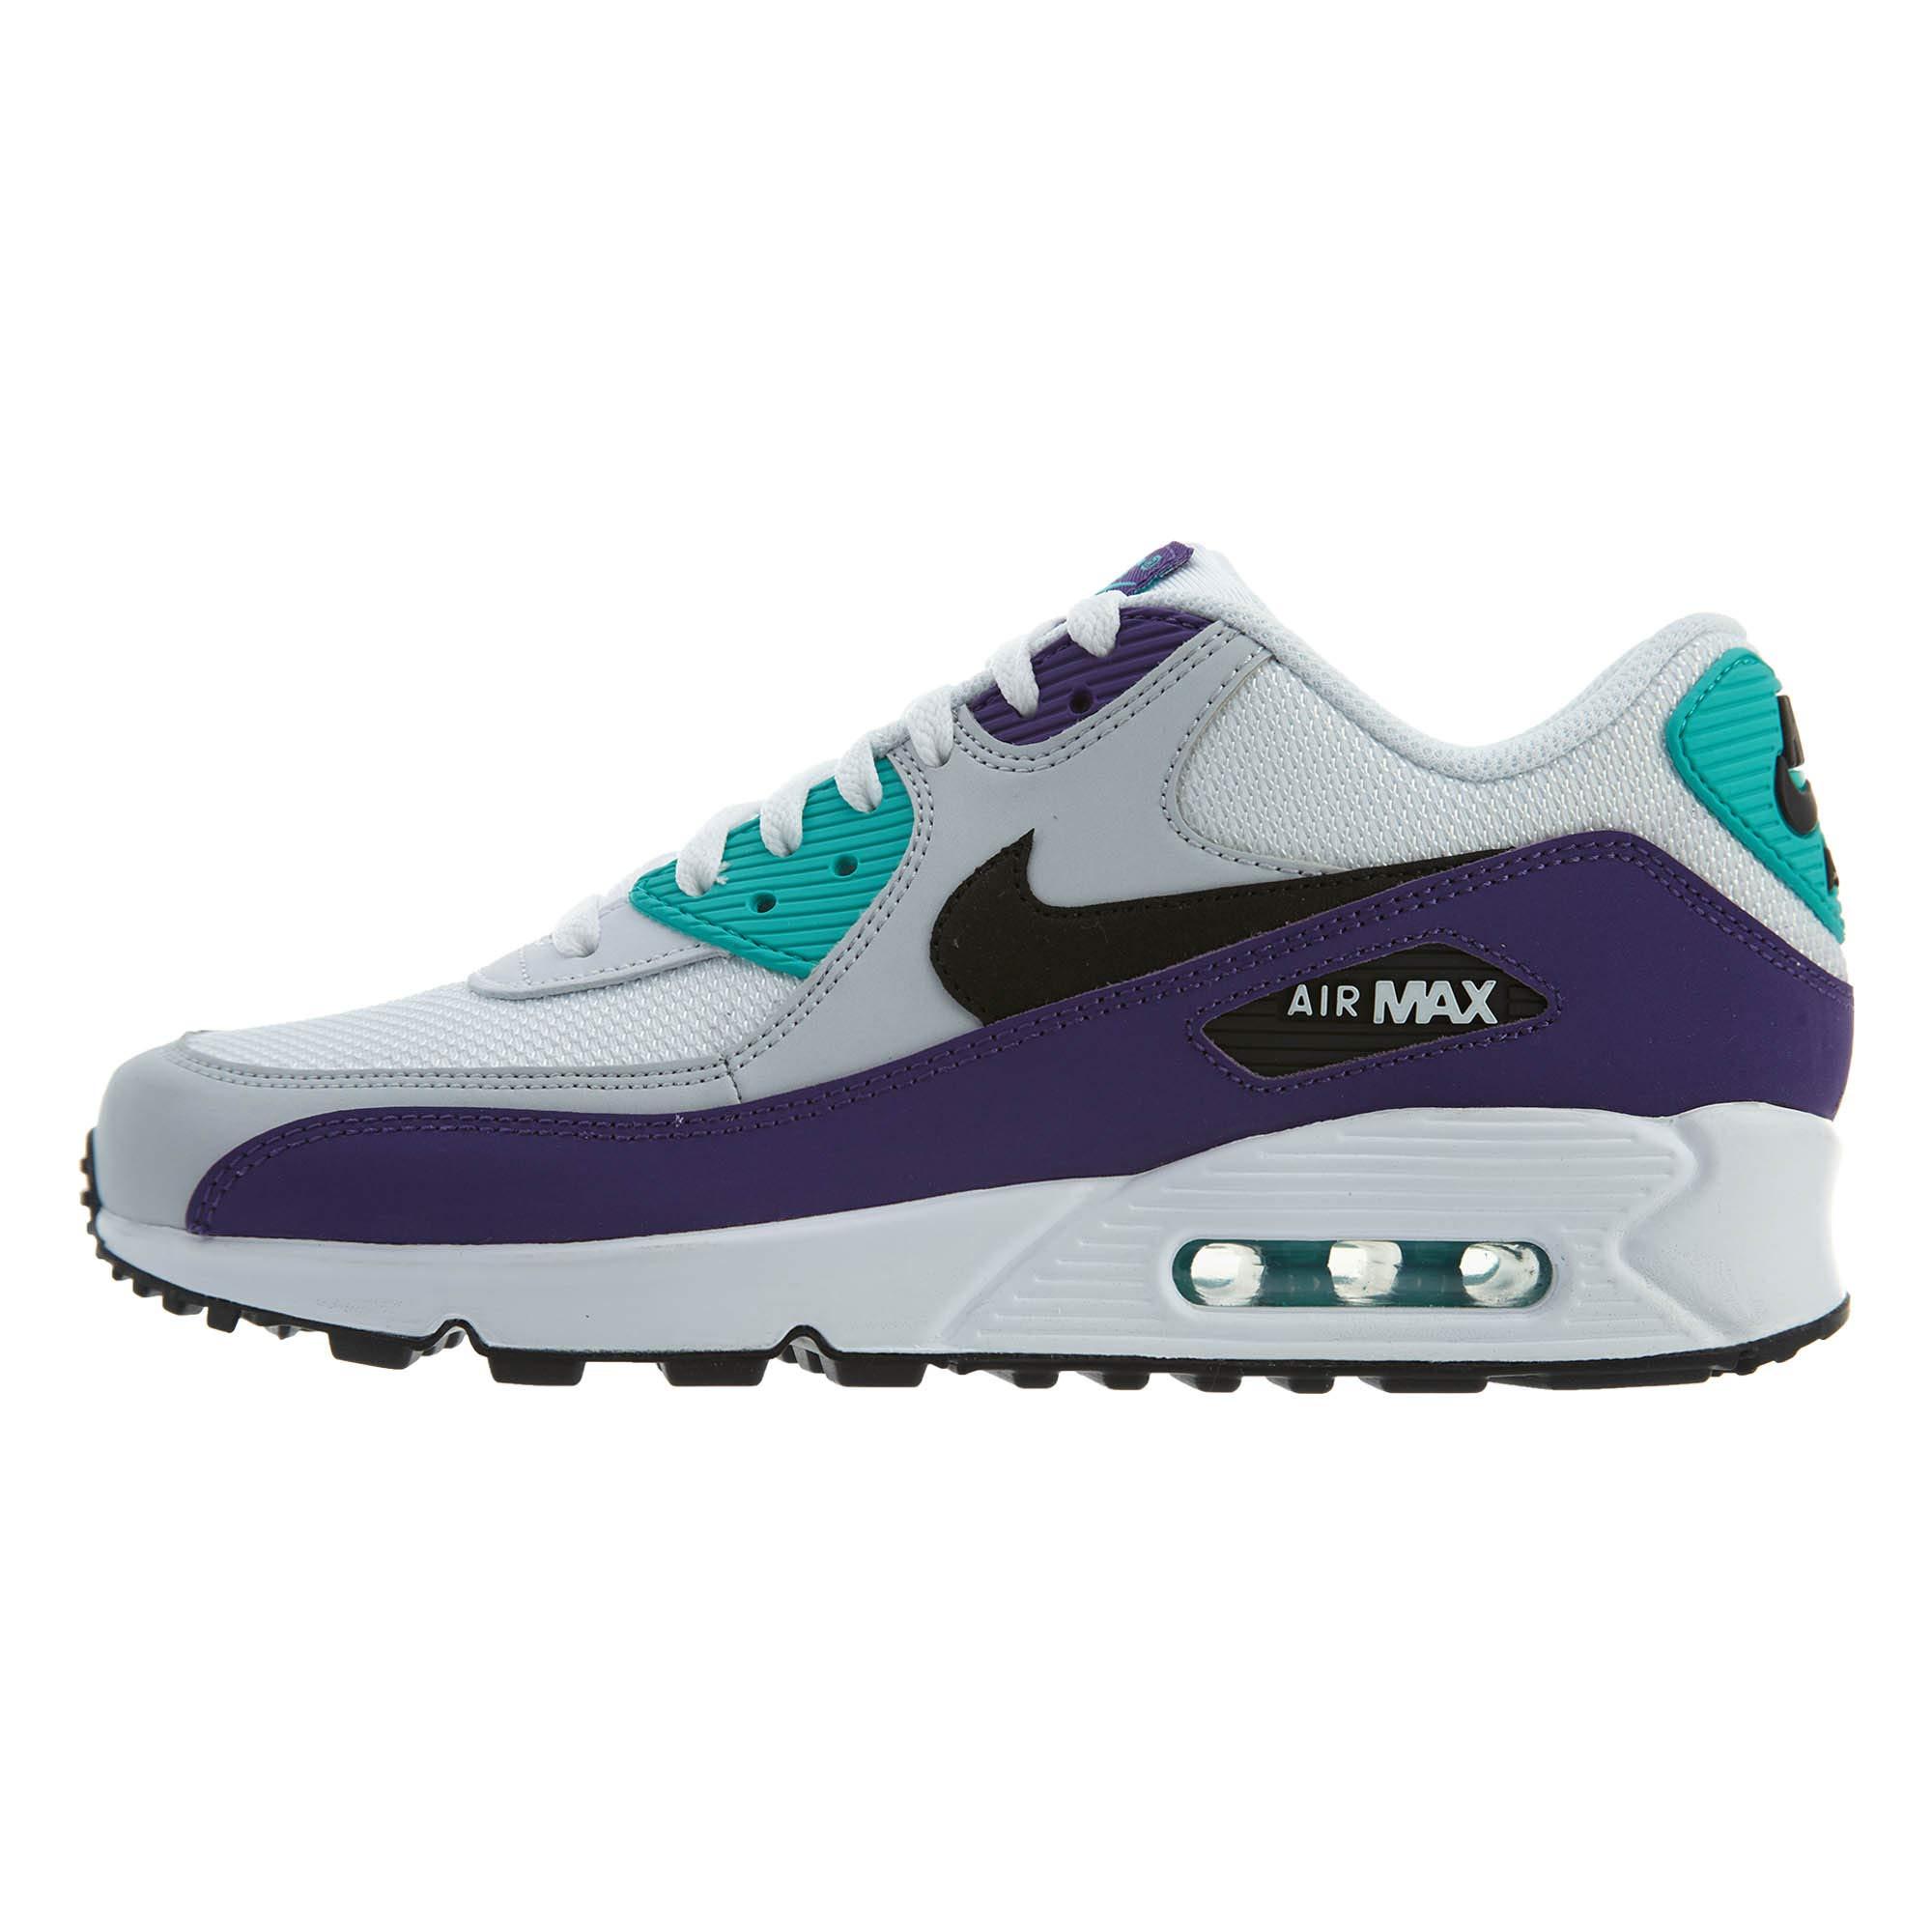 purchase cheap 2e8b0 7baf3 Nike Men s Air Max 90 White Black Hyper Jade Court Purple Leather Casual  Shoes 7.5 M US